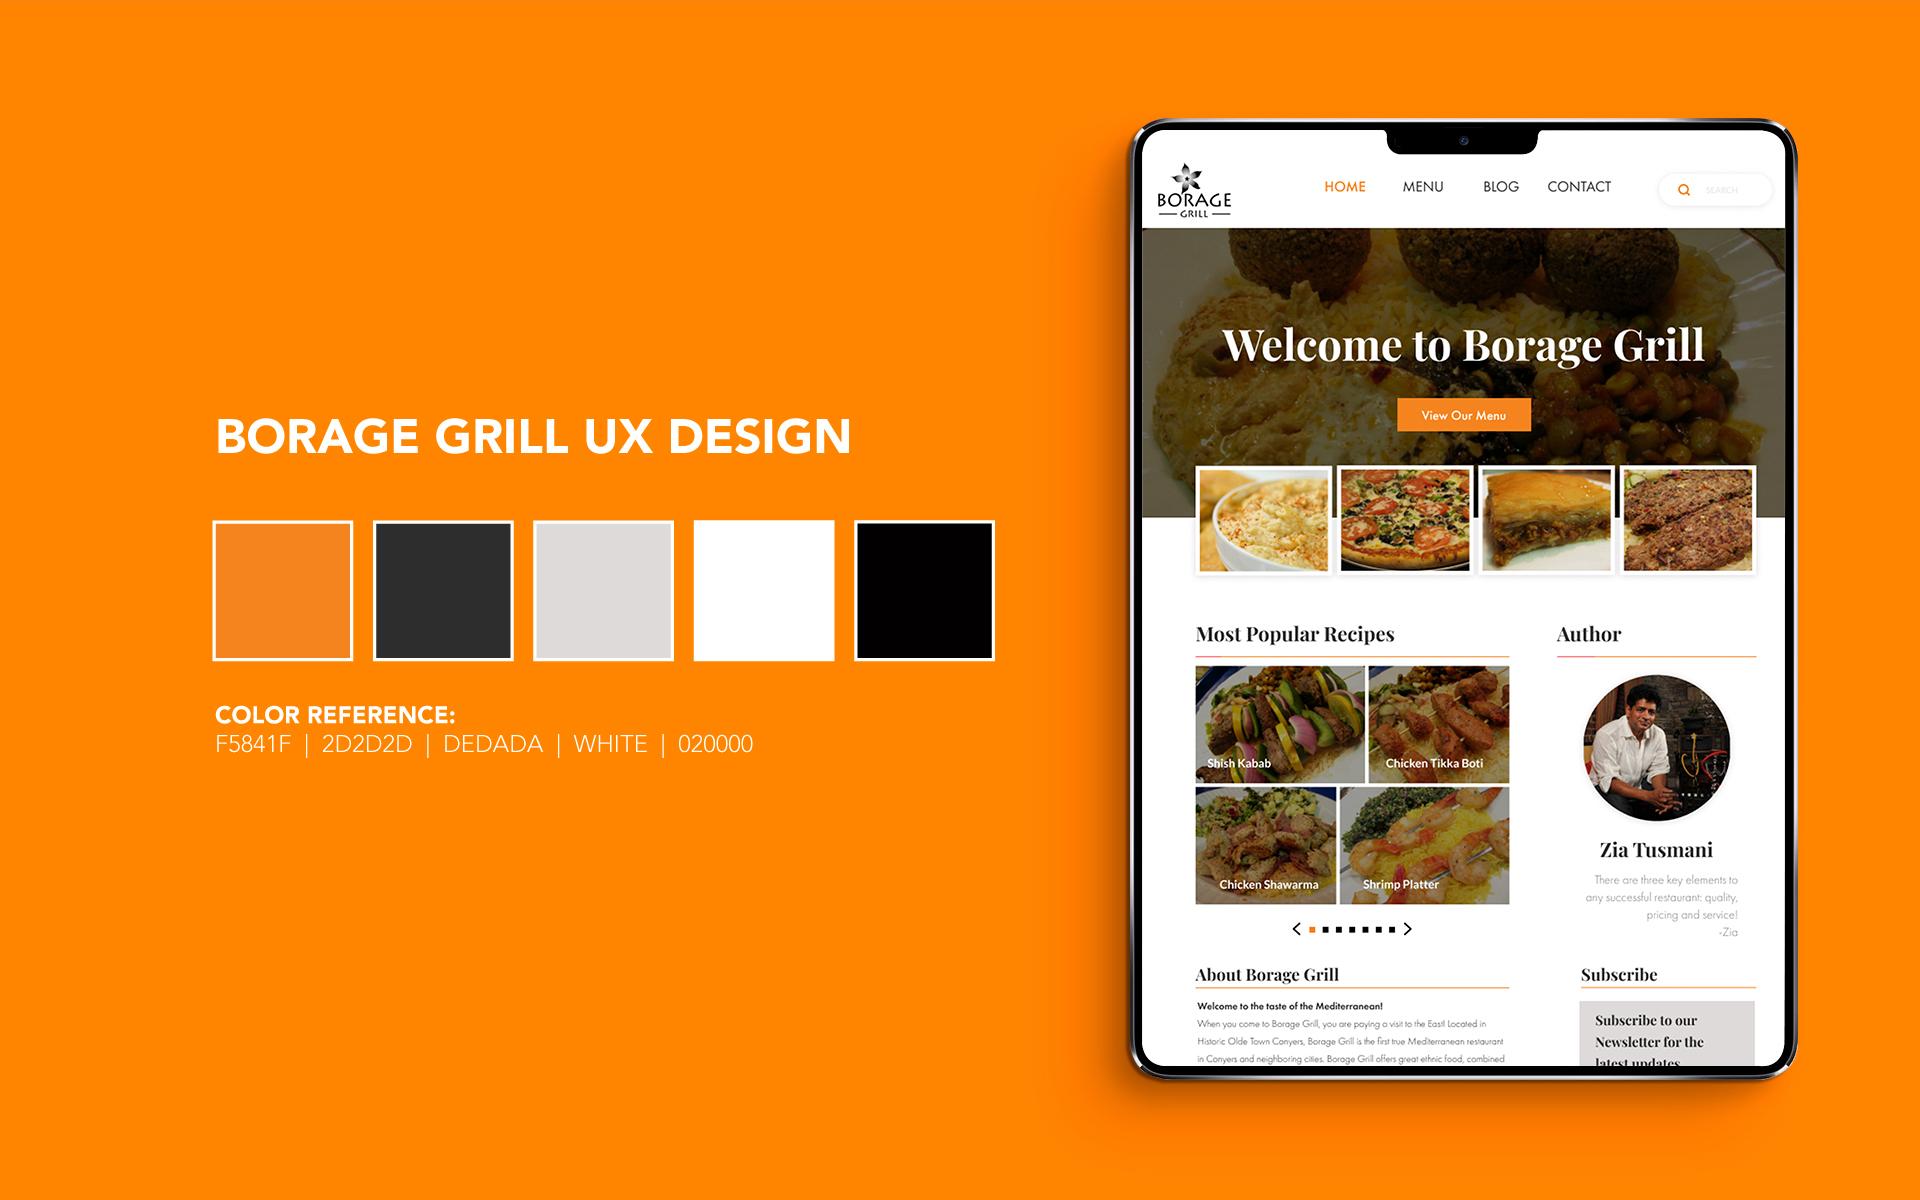 Borage Grill UX Design Header